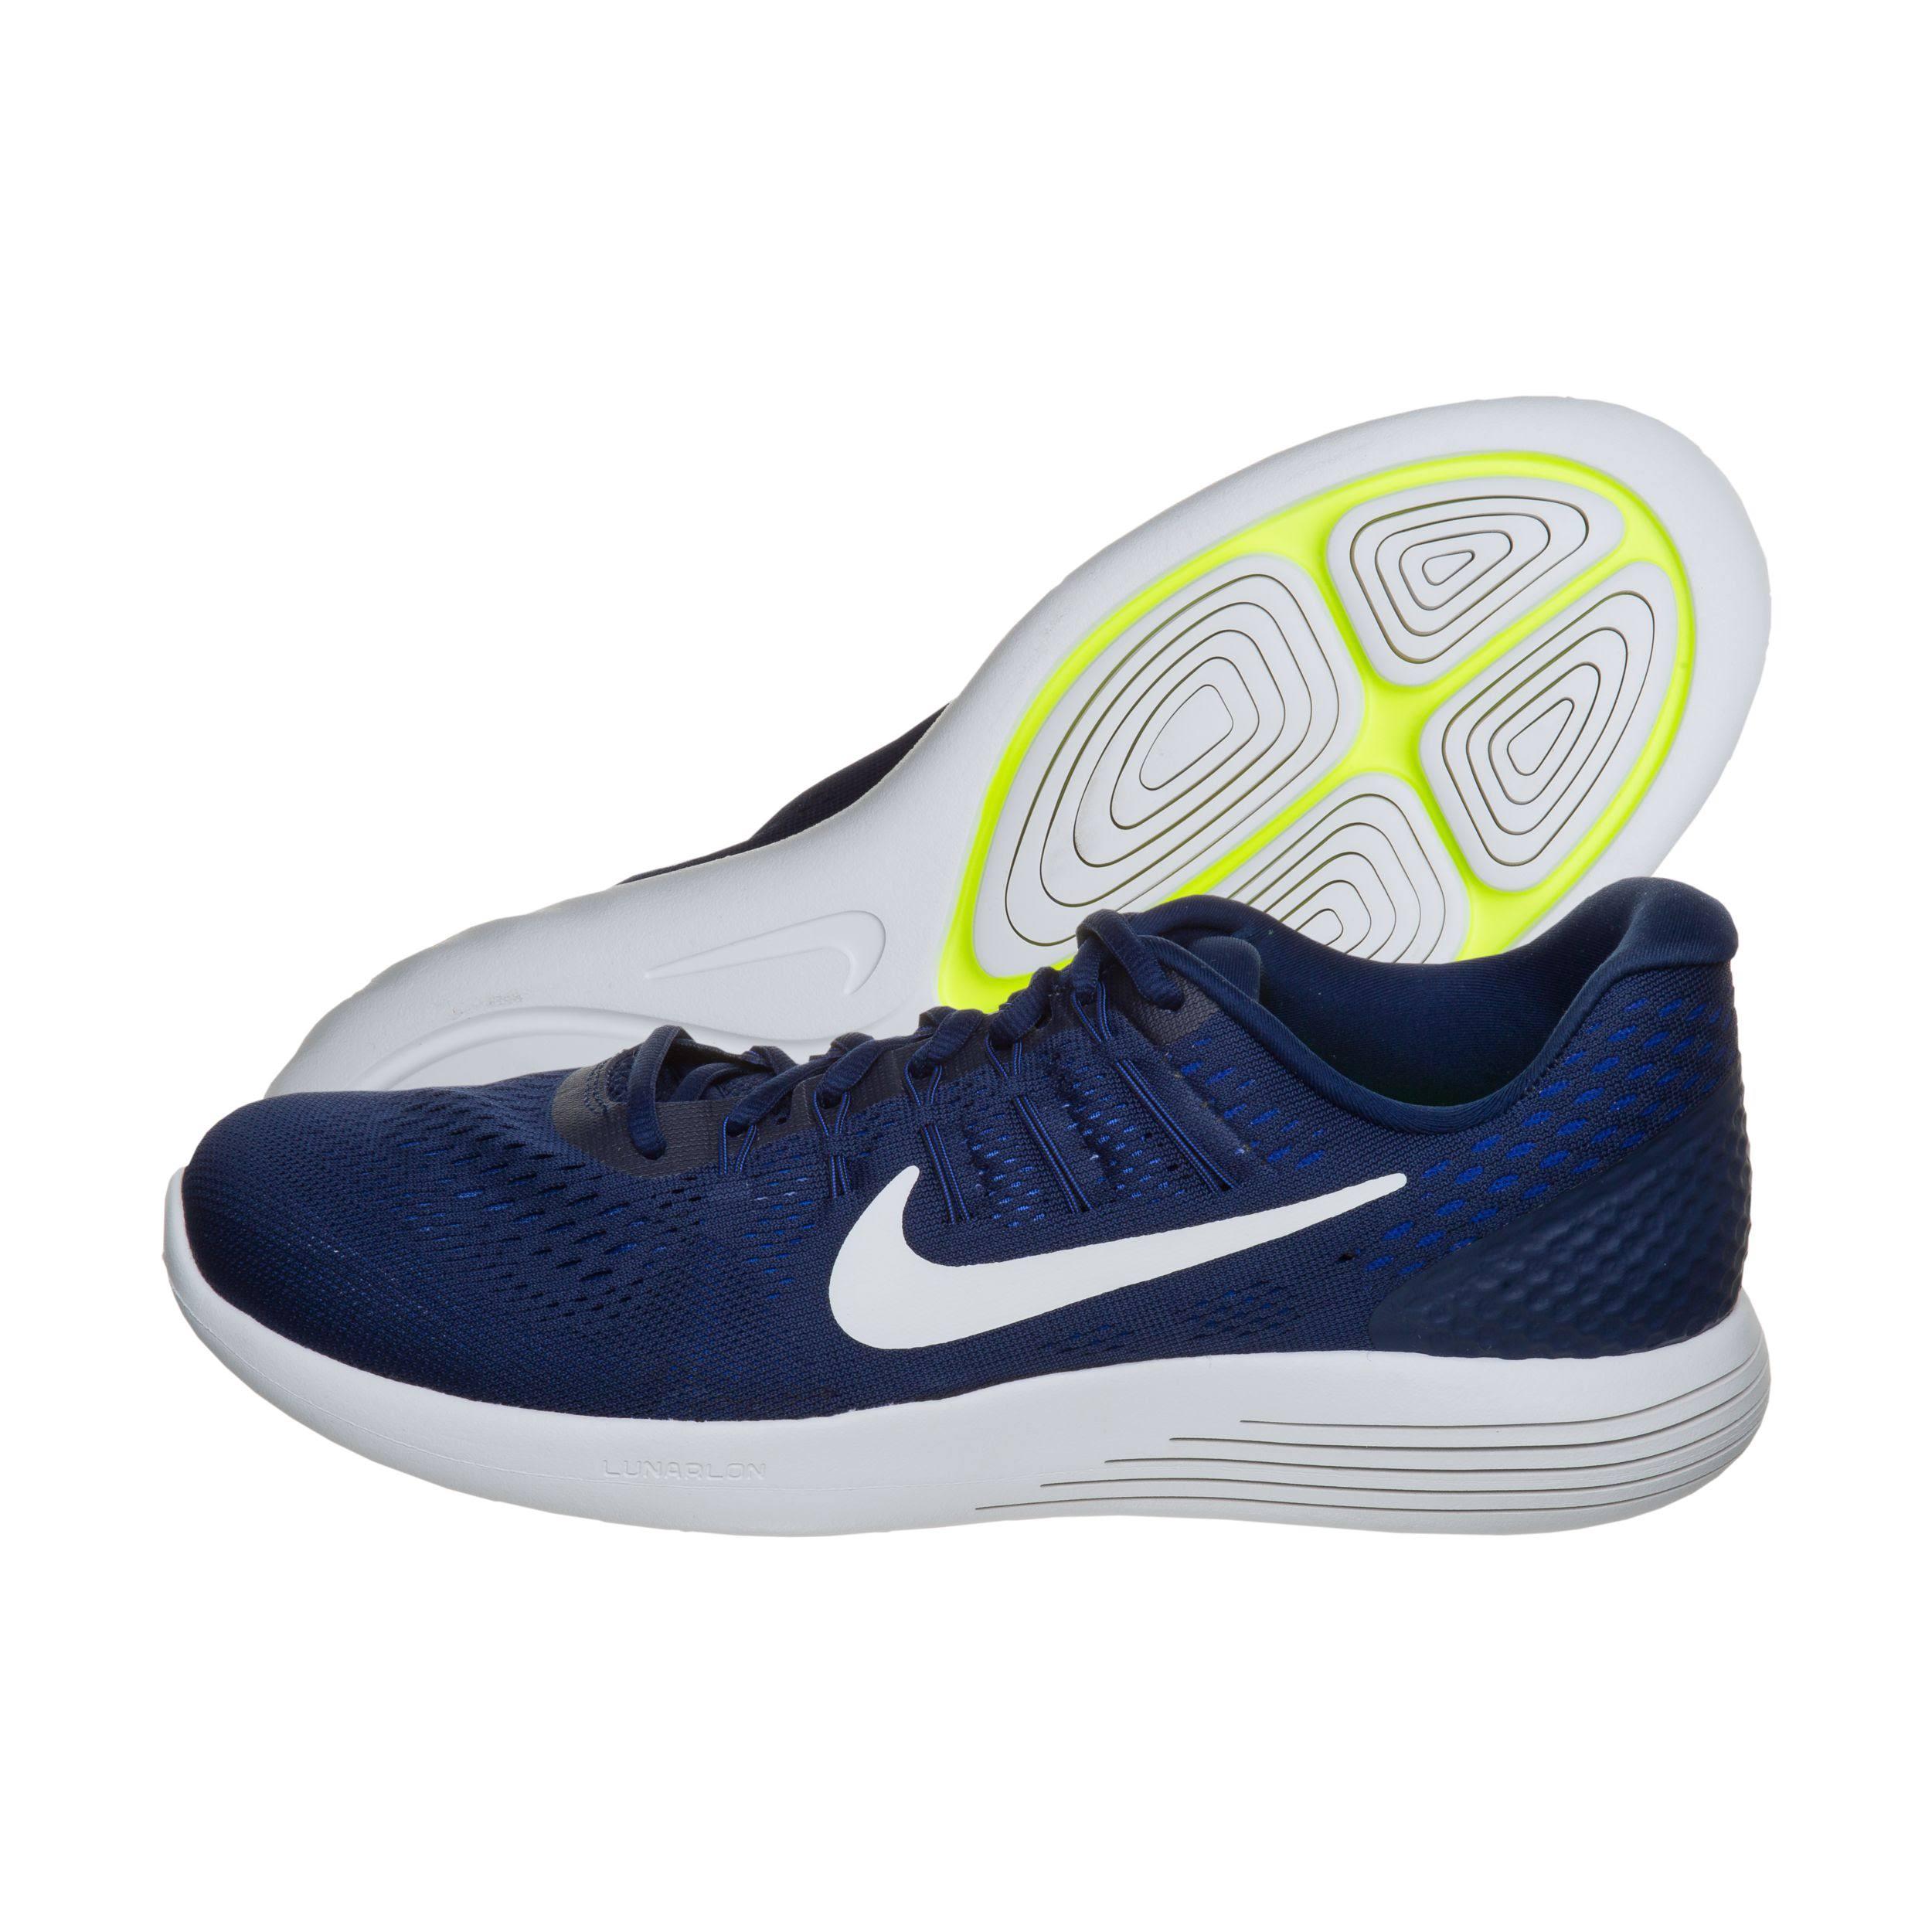 White black Nike 404 843725 Weiss Lunarglide summit Marineblau Blue Binary 8 wBrUvwz